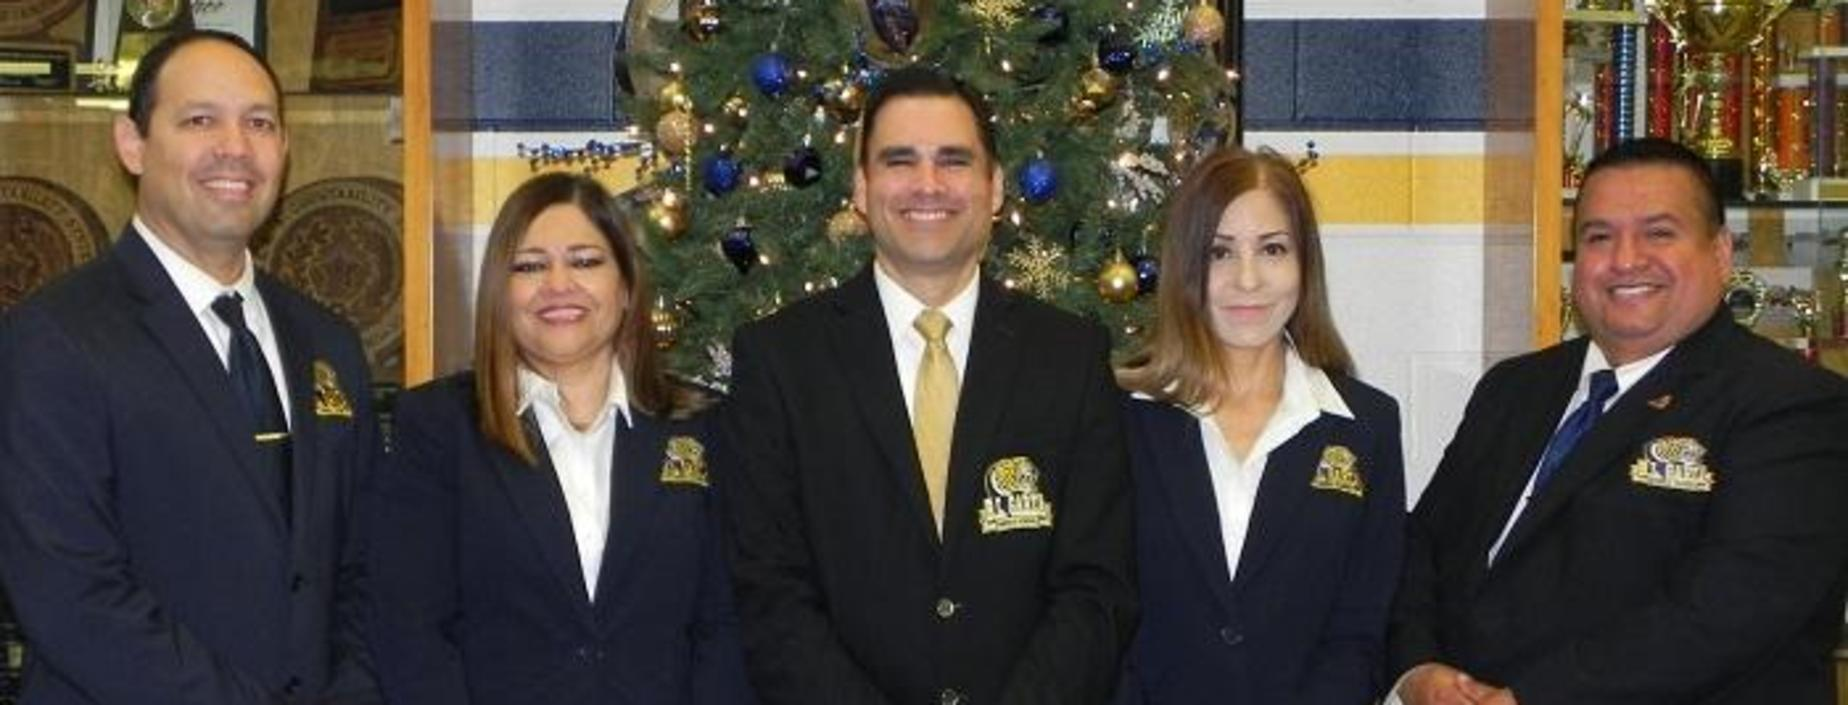 Principals 2018